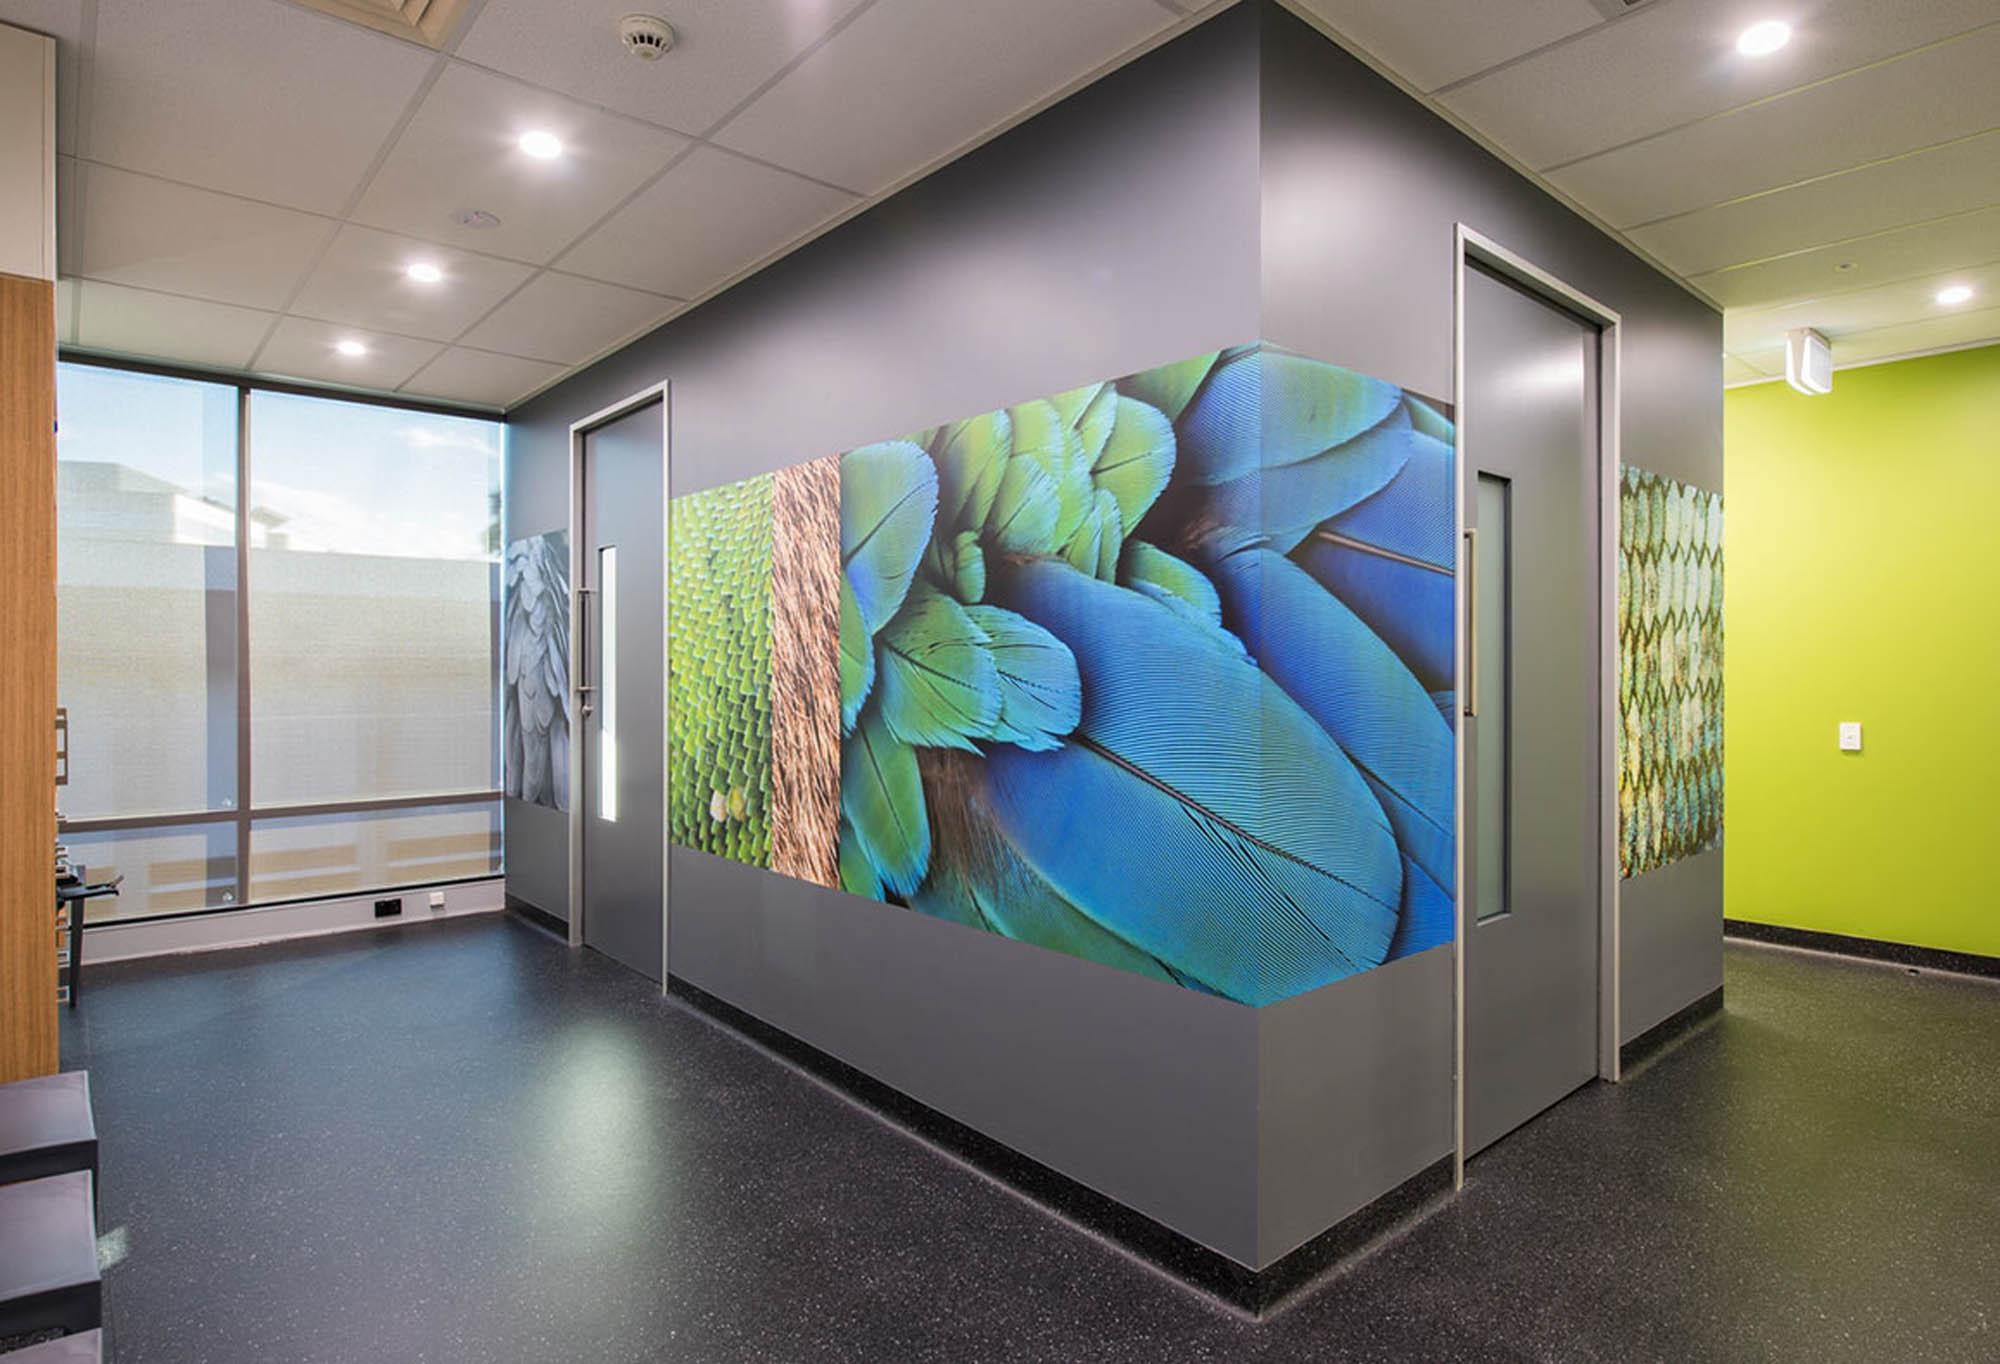 small animal specialist hospital sydney vetinary hospital fitout construction storage room